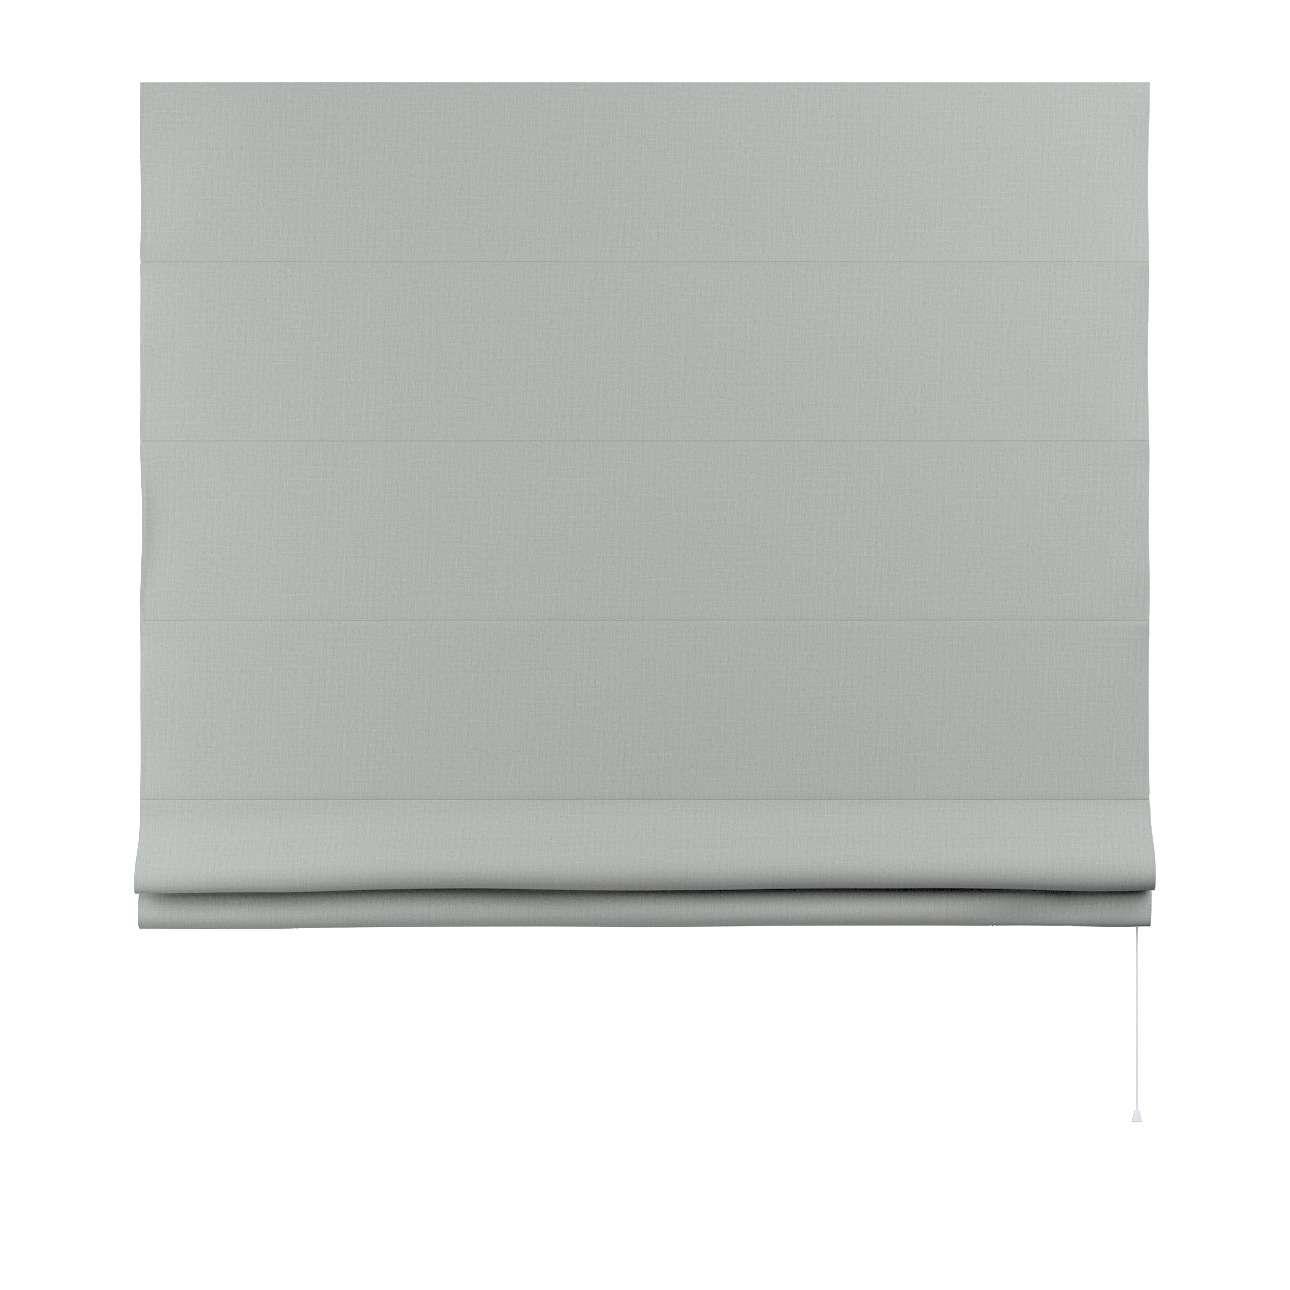 Vouwgordijn Capri van de collectie Blackout 280 cm, Stof: 269-13